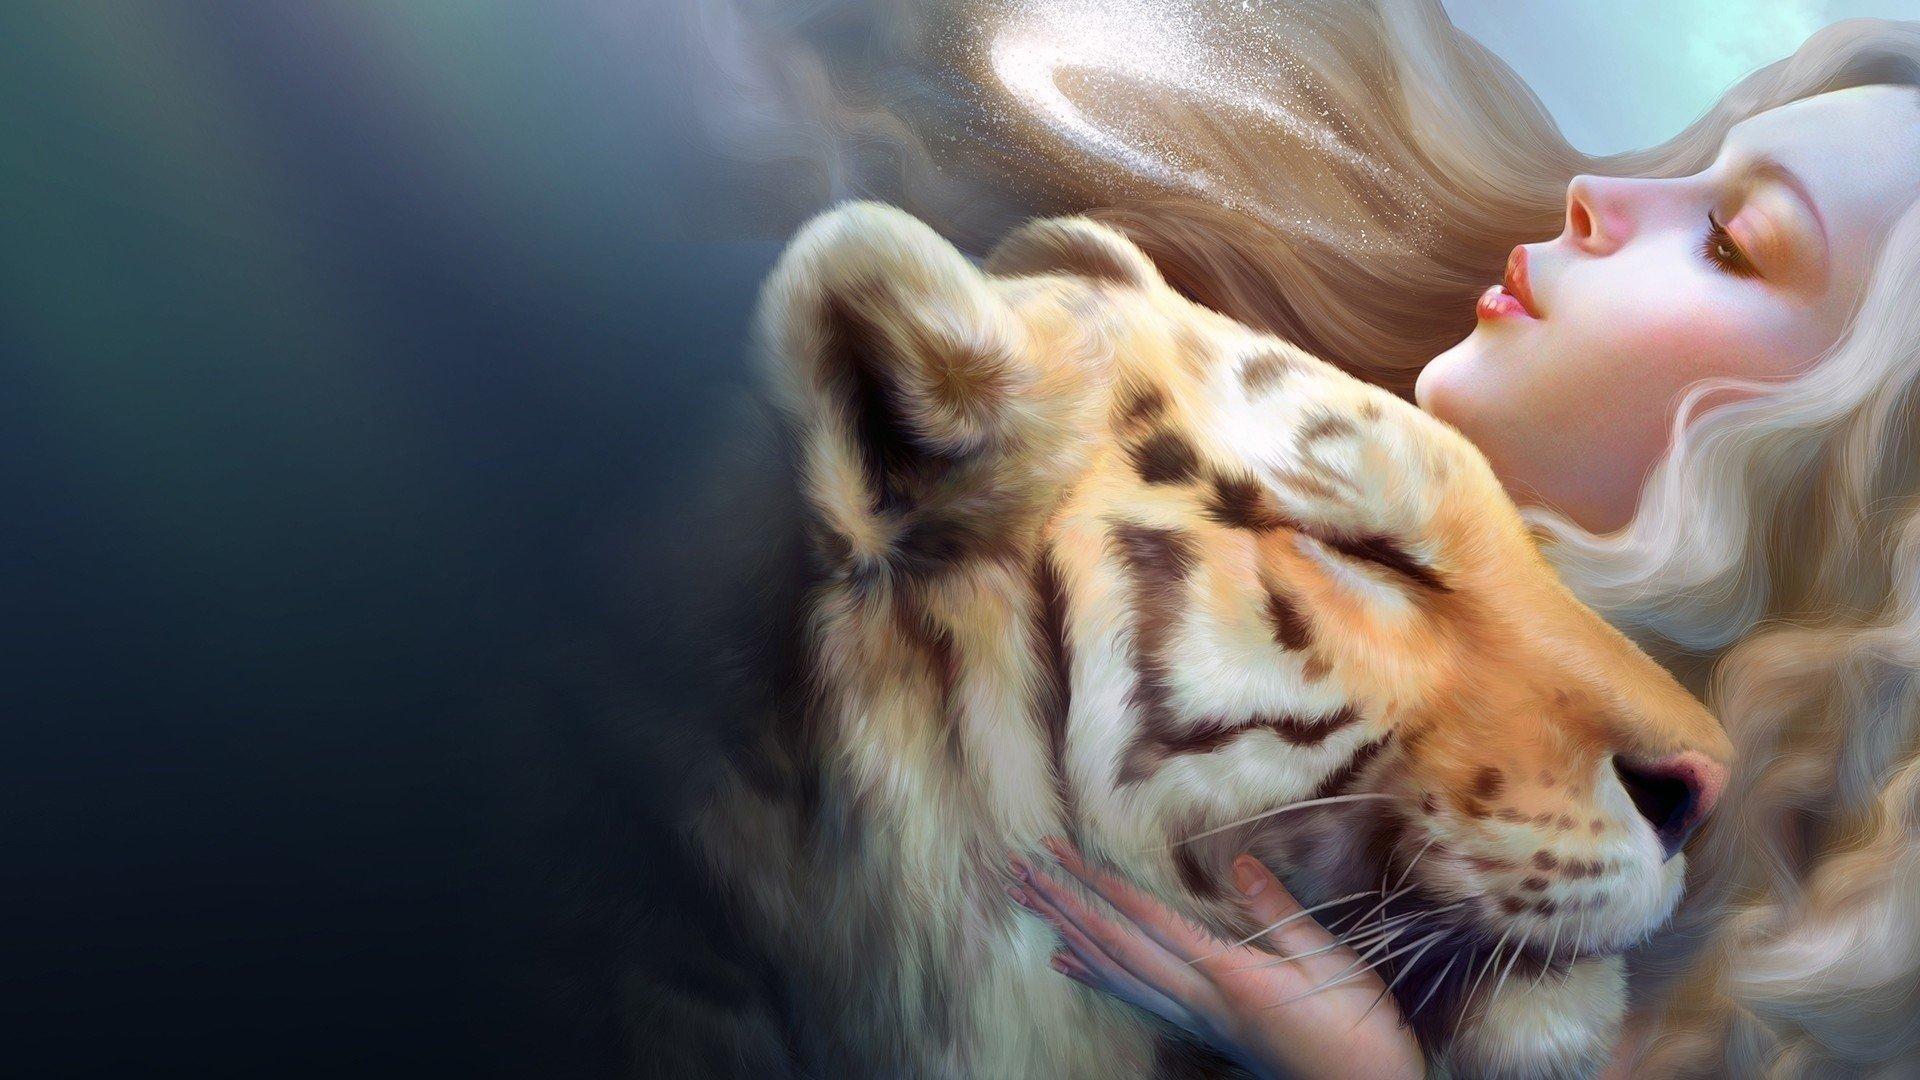 Wallpaper Una mujer con un tigre Images